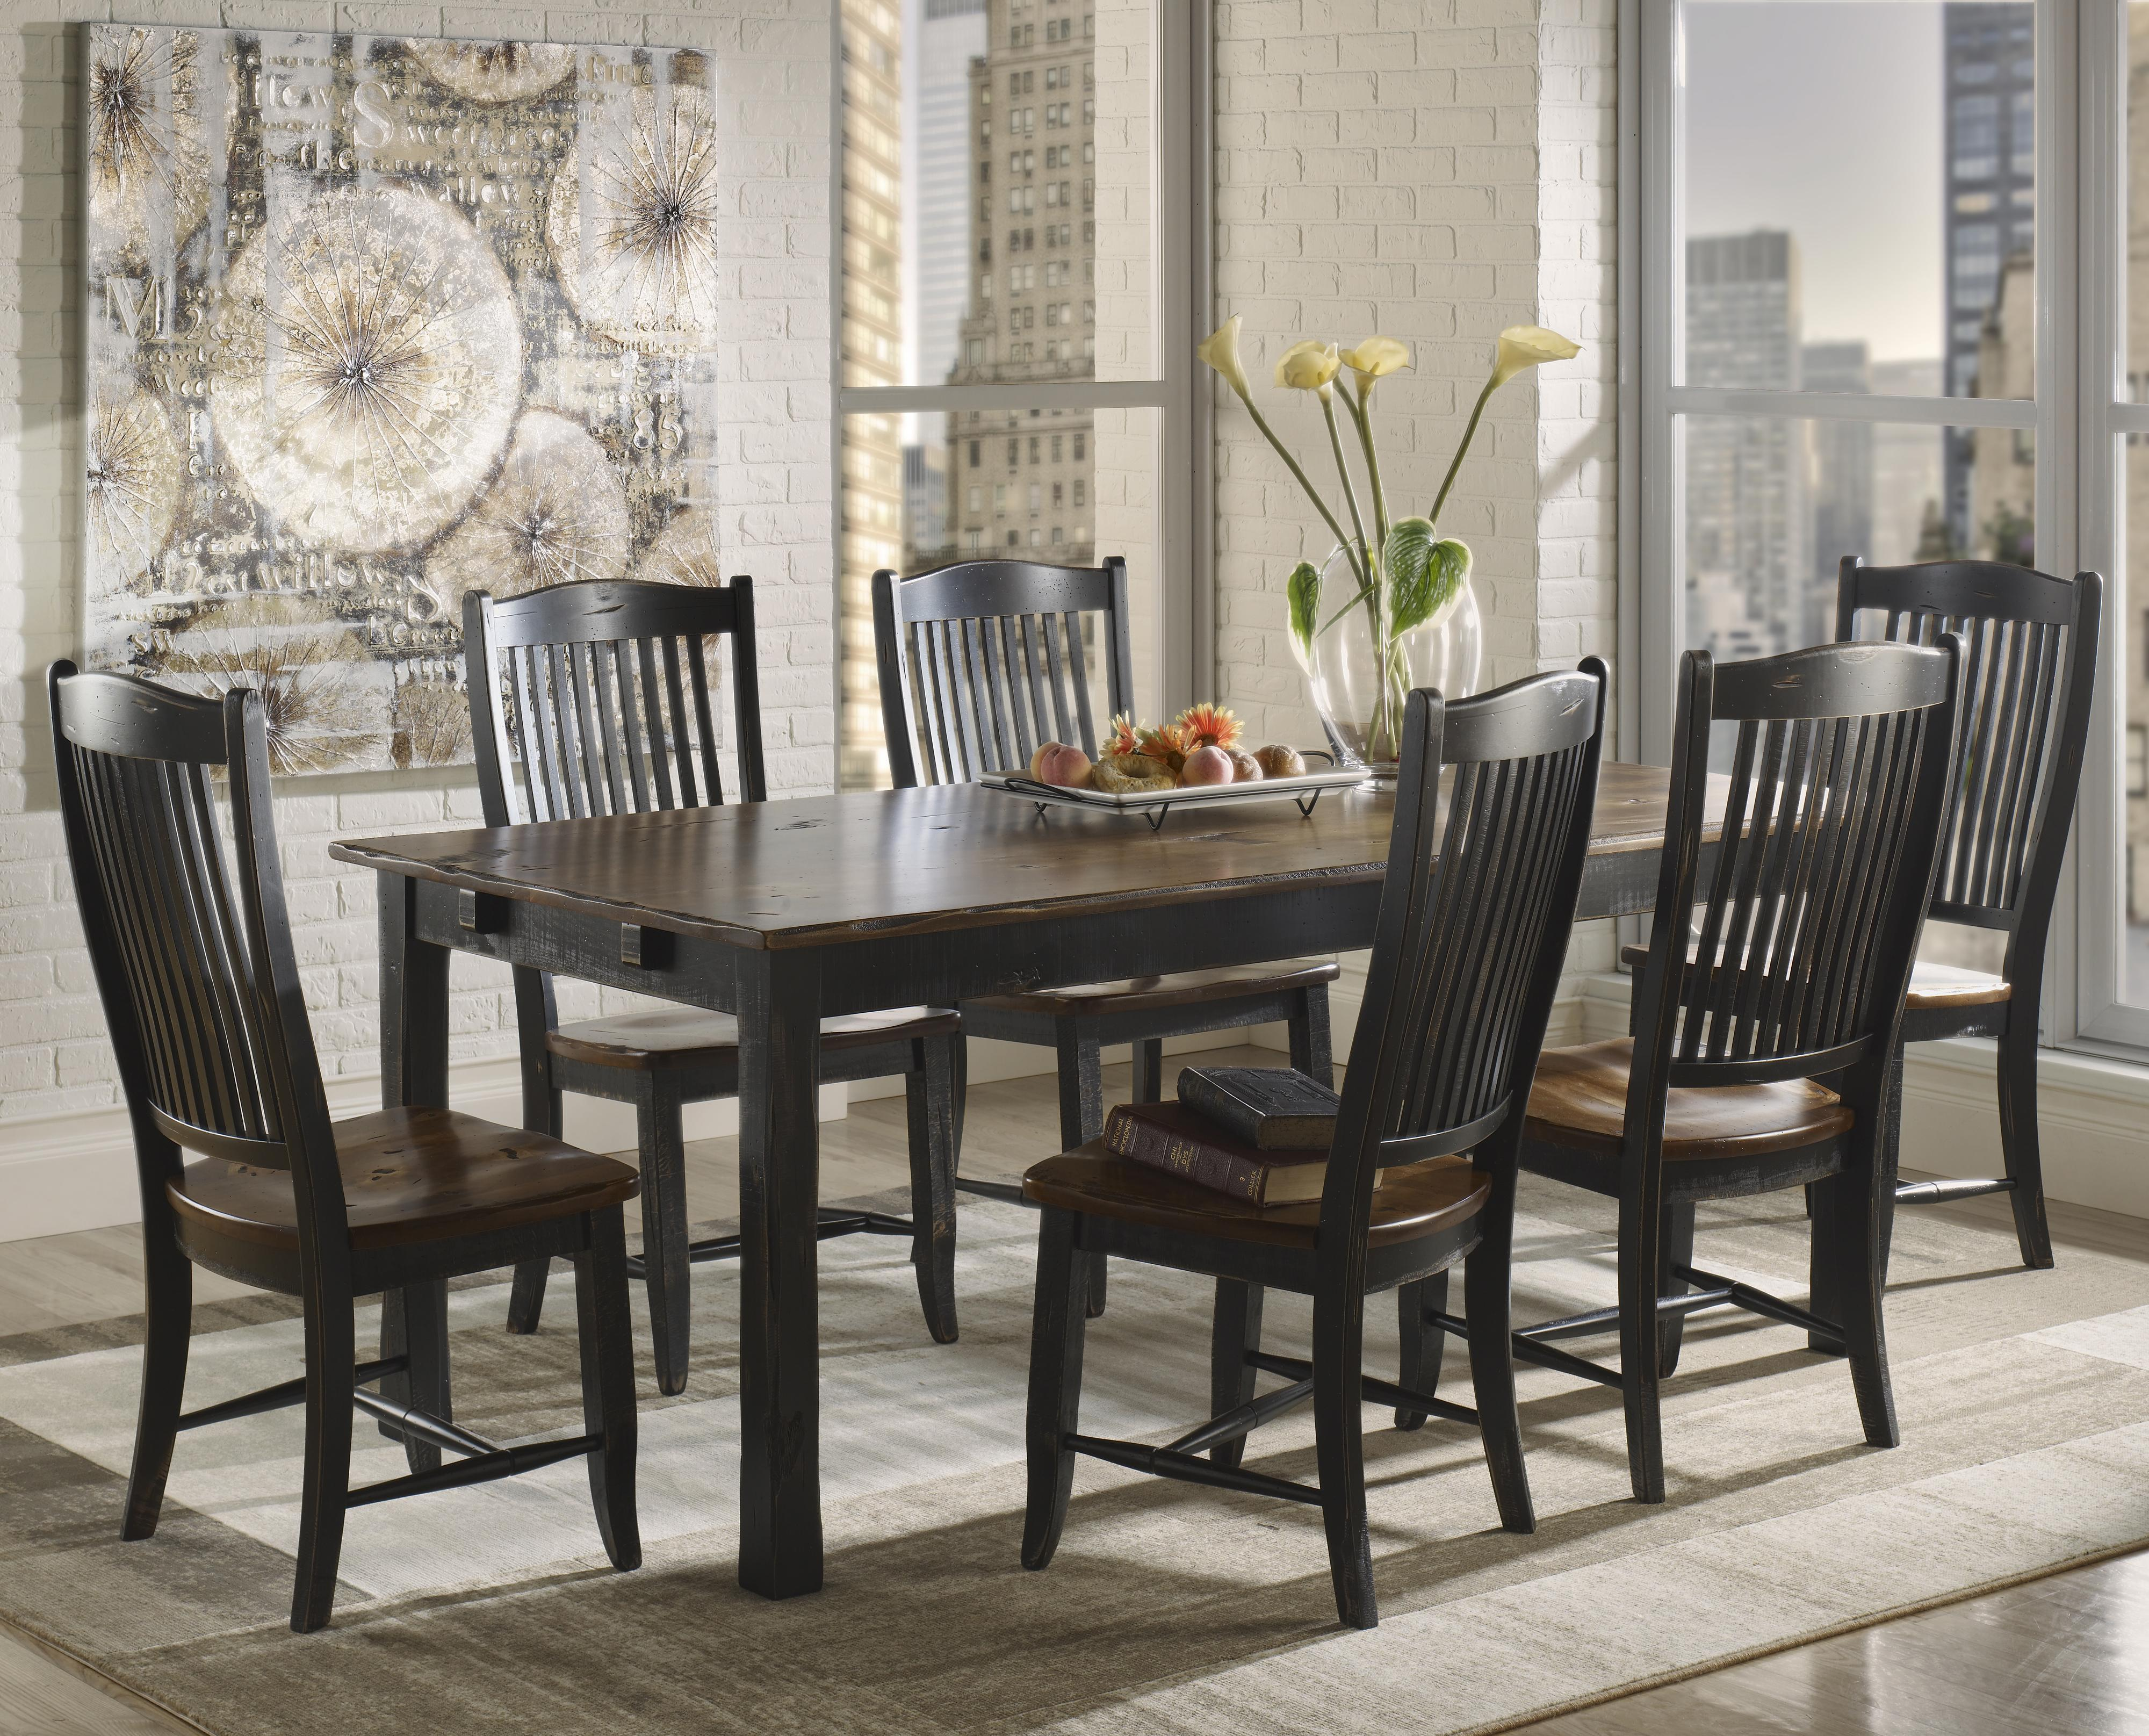 Champlain - Custom Dining <b>Customizable</b> Rectangular Table Set by Canadel at Jordan's Home Furnishings